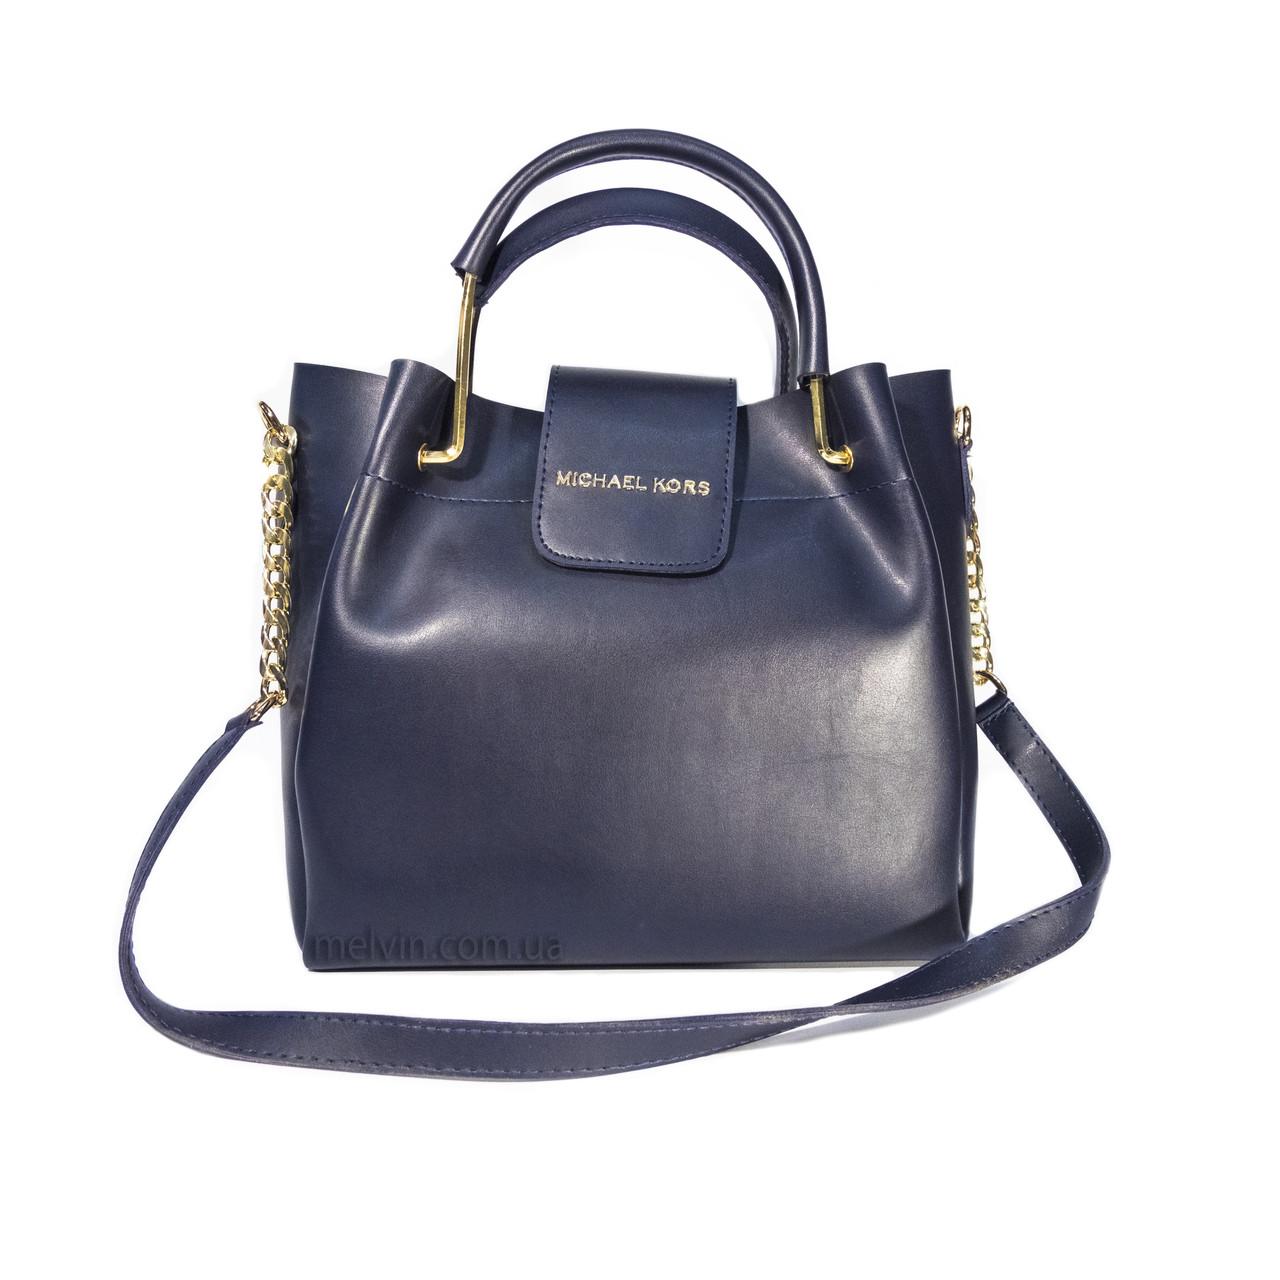 Женская сумочка в стиле Michael Kors синяя